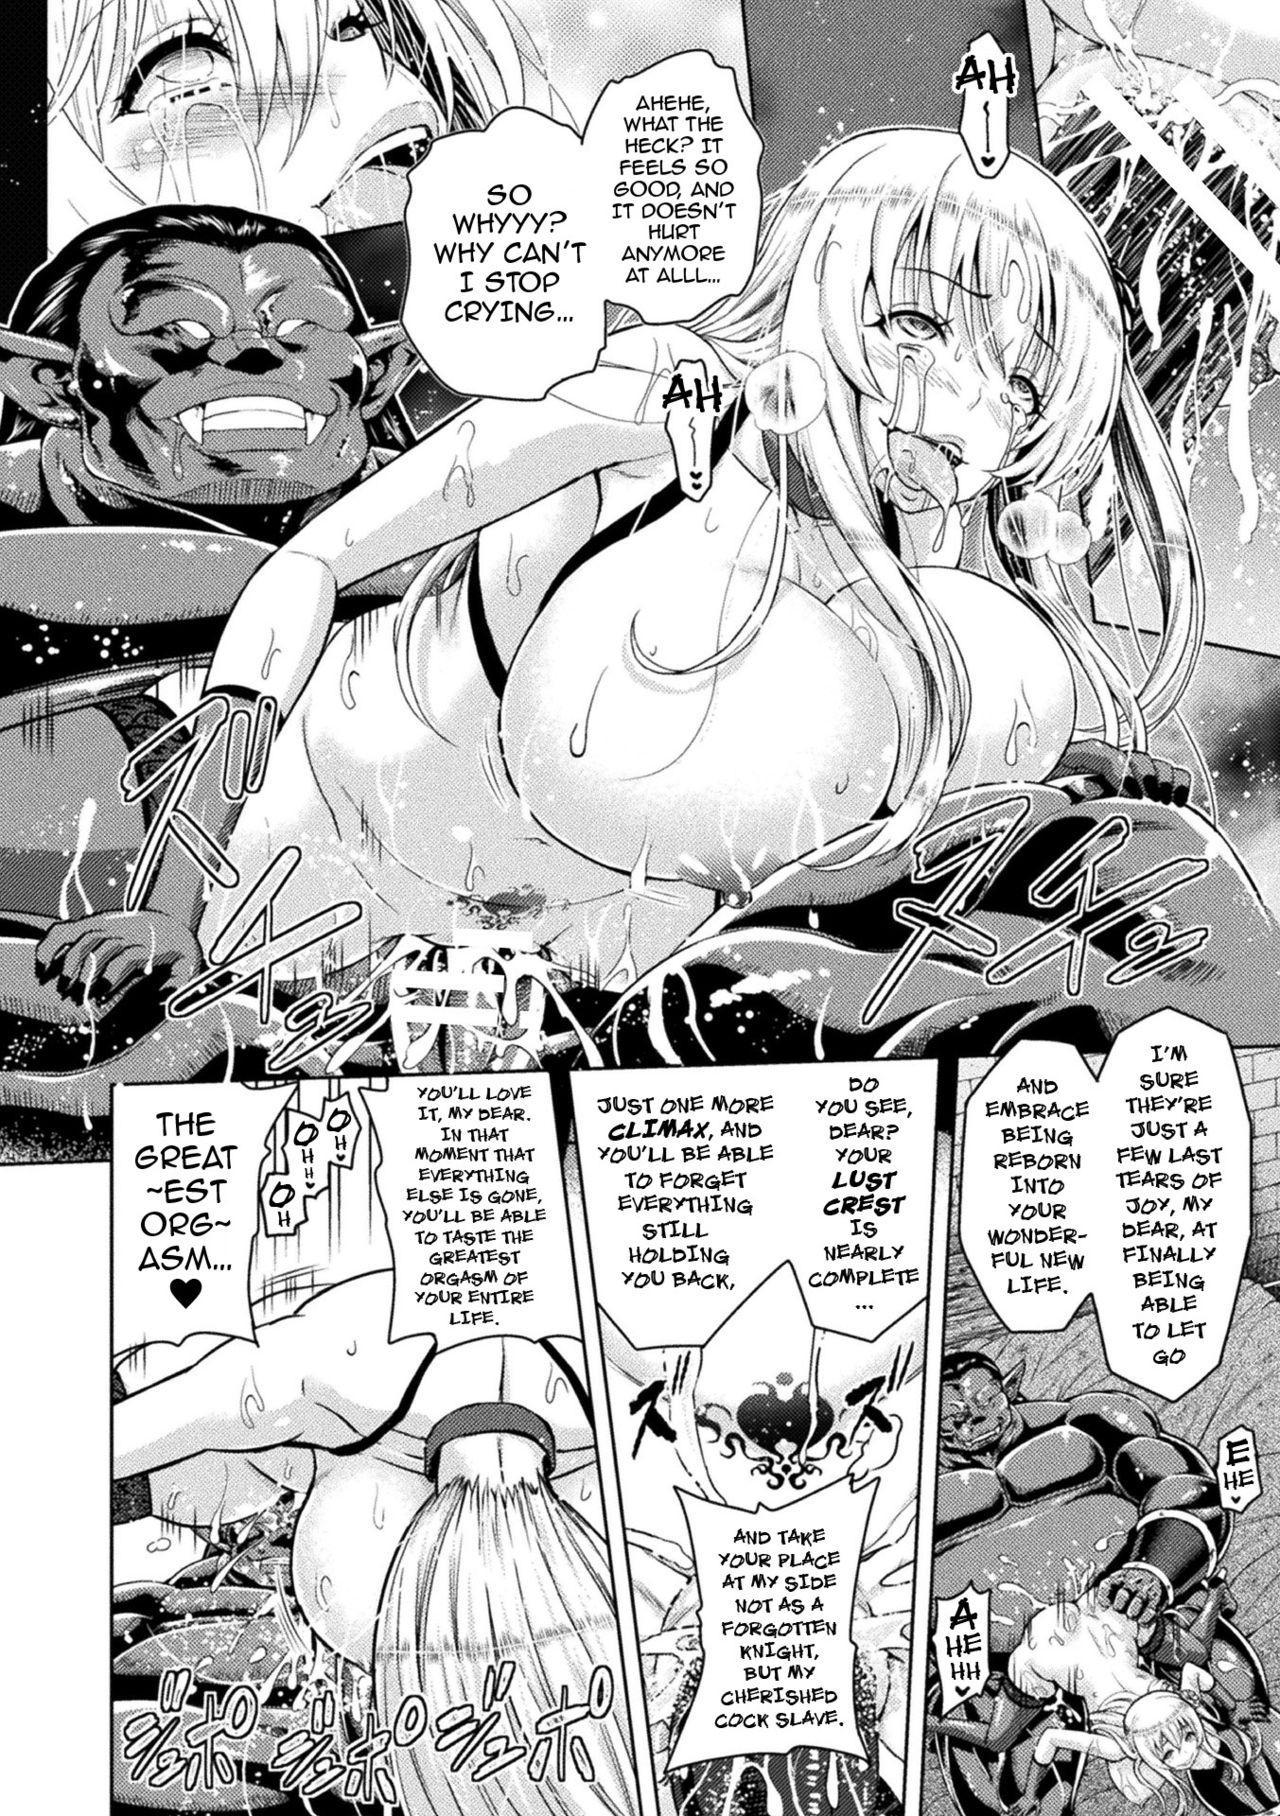 [Yamada Gogogo] Erona ~Orc no Inmon ni Okasareta Onna Kishi no Matsuro~ | Erona ~The Fall of a Beautiful Knight Cursed with the Lewd Mark of an Orc~ Ch. 1-3 [English] {darknight} 72